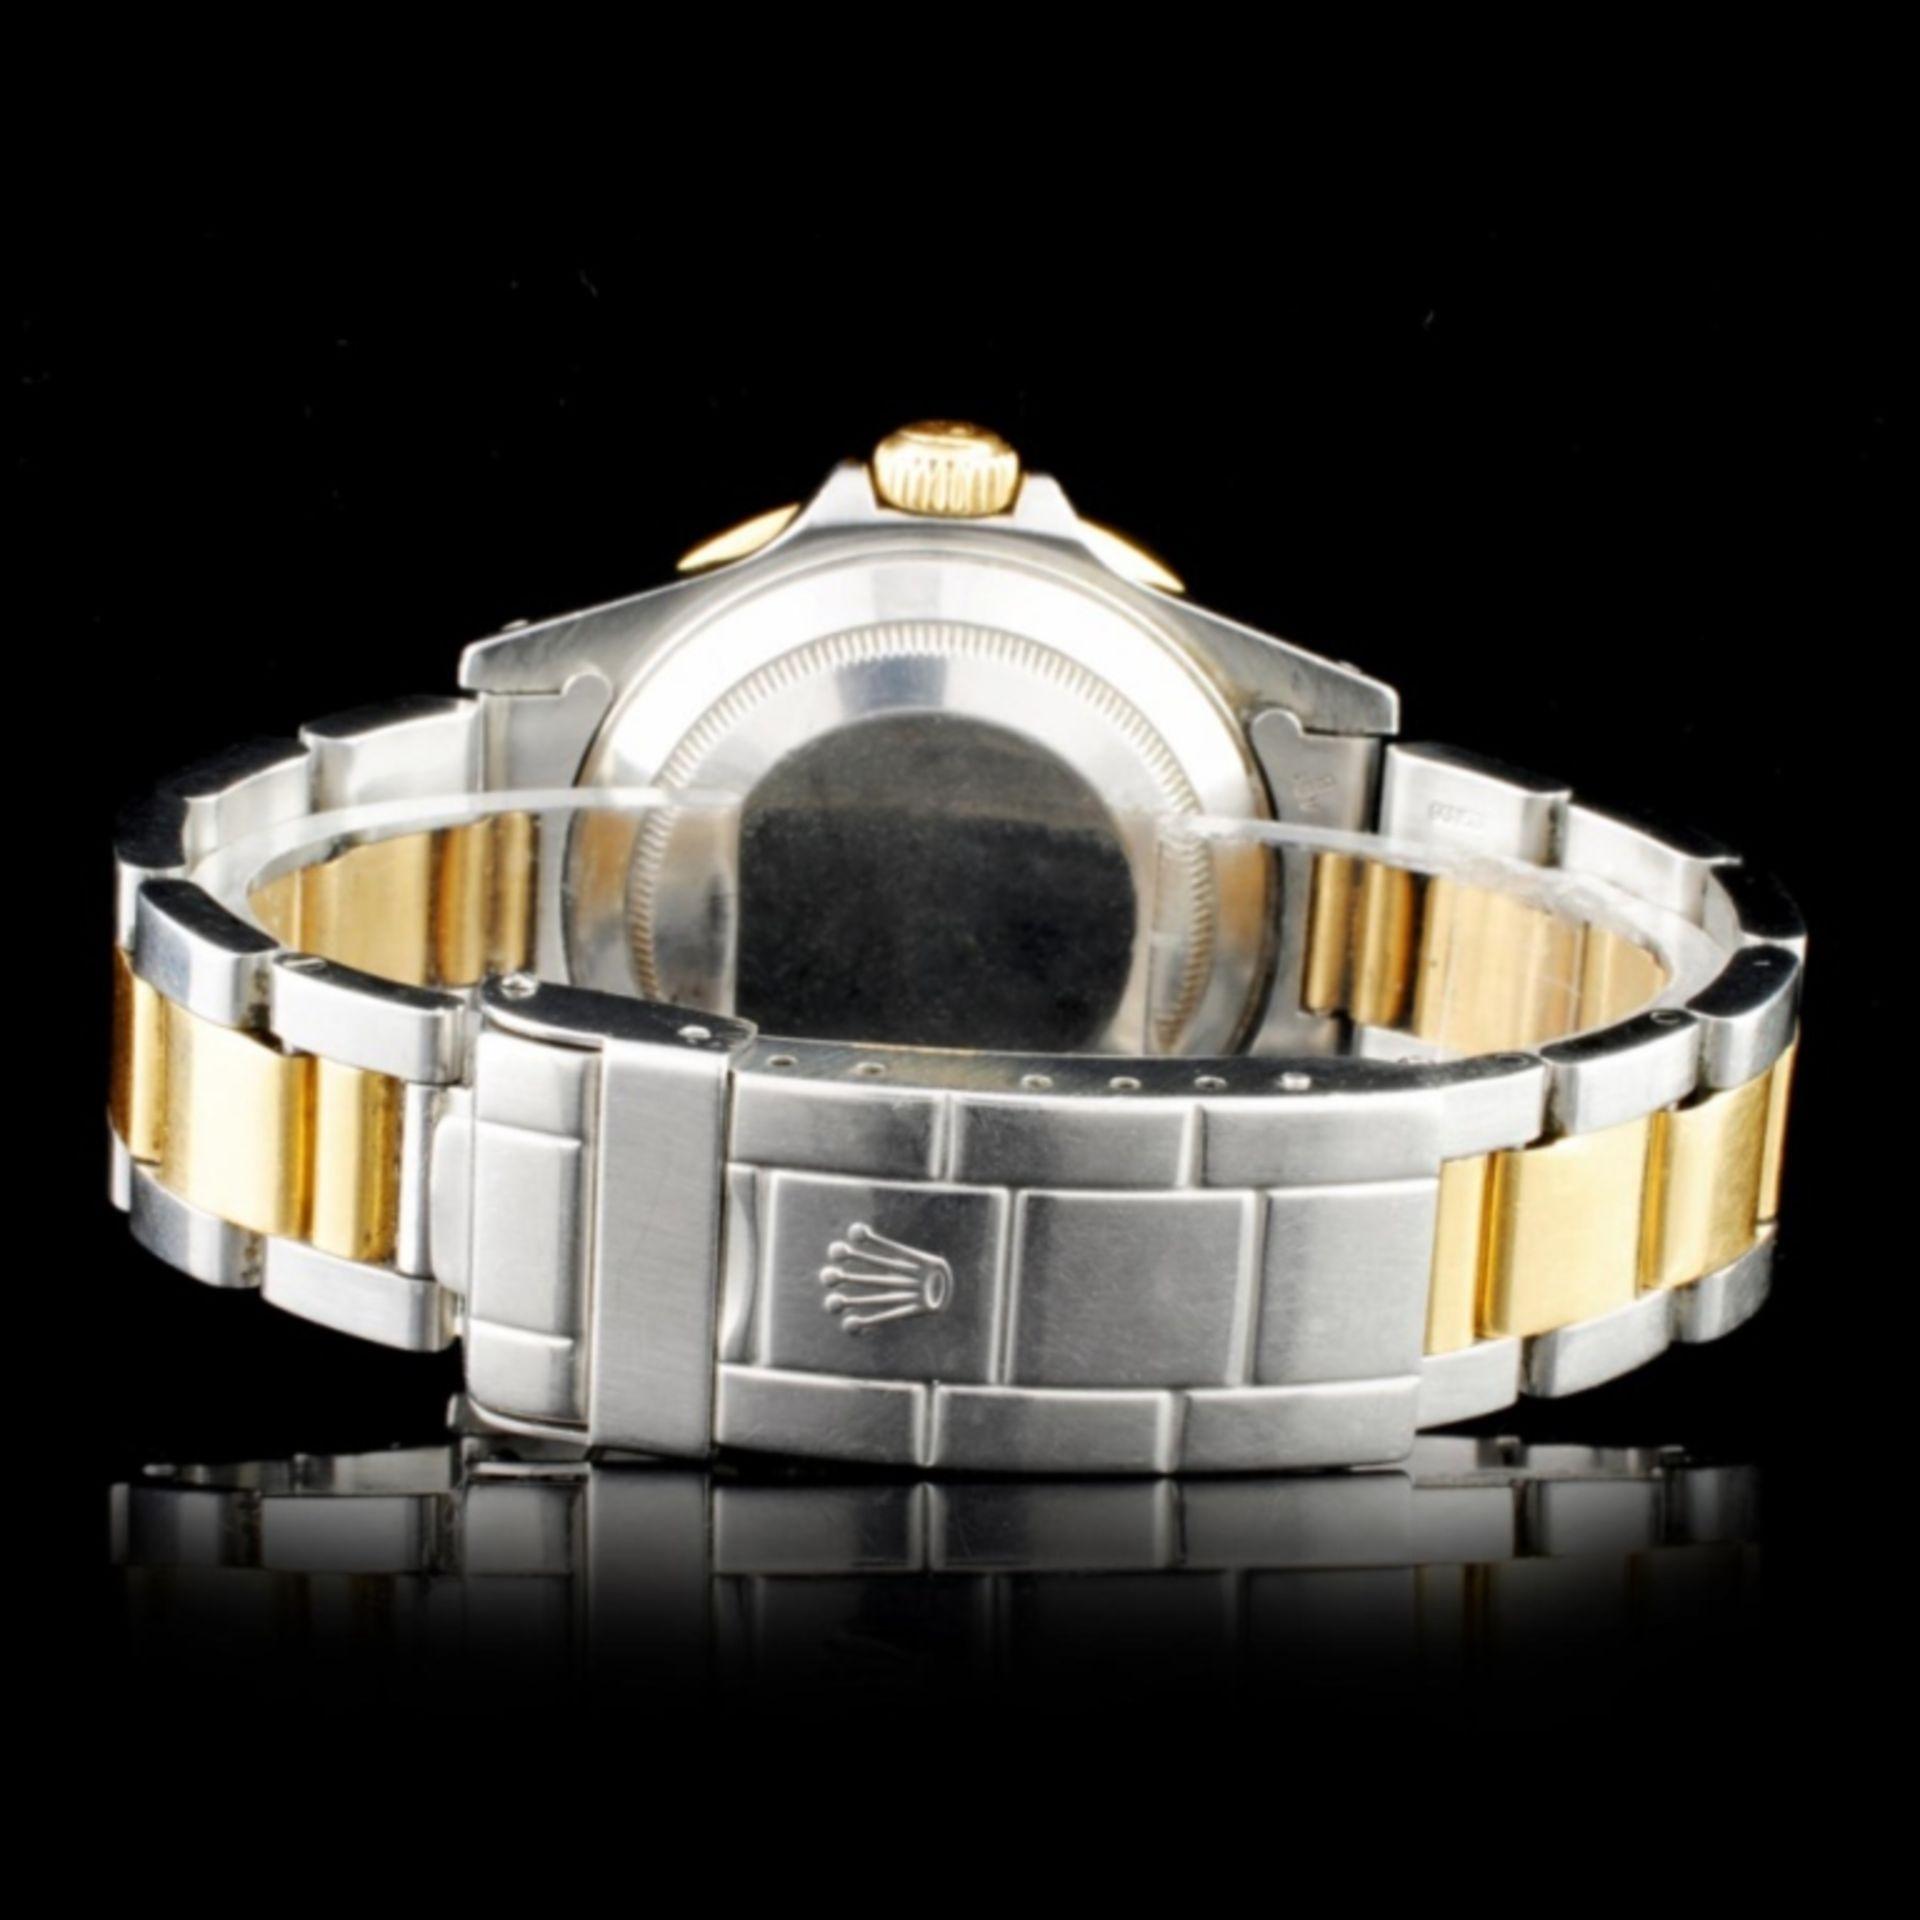 Rolex YG/SS Submariner Diamond 40MM Watch - Image 3 of 5